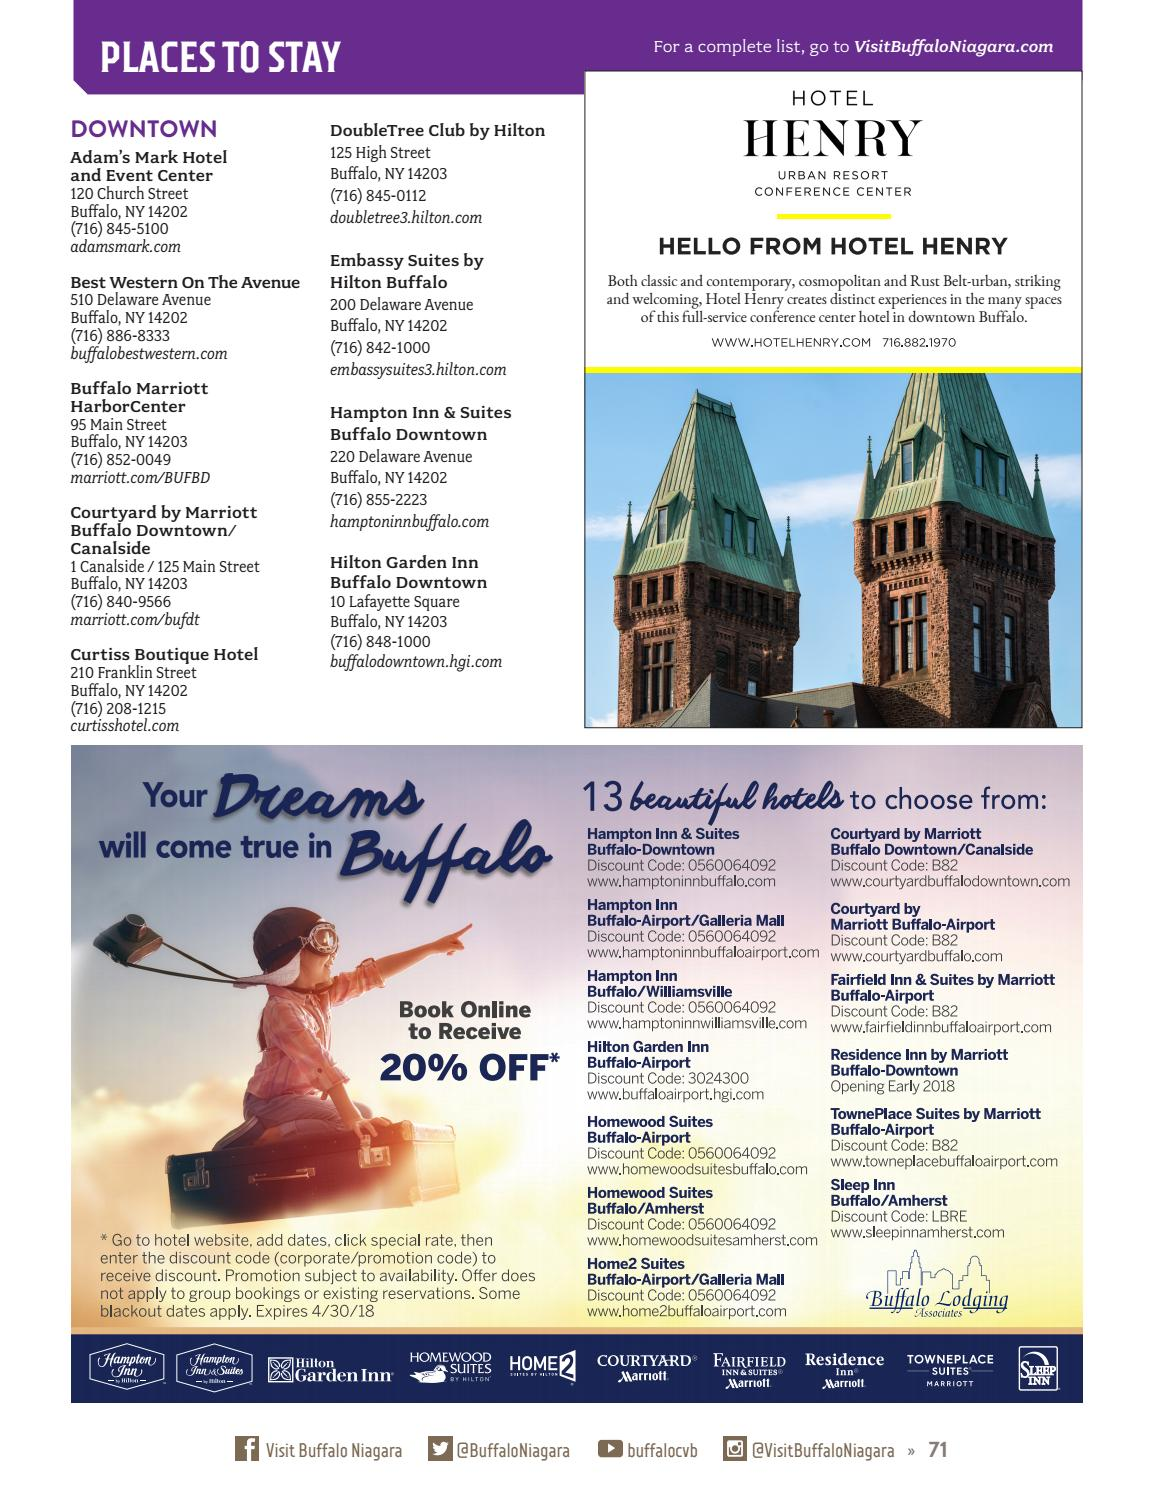 Buffalo Niagara Touring Guide 2017 by Matt Steinberg - issuu